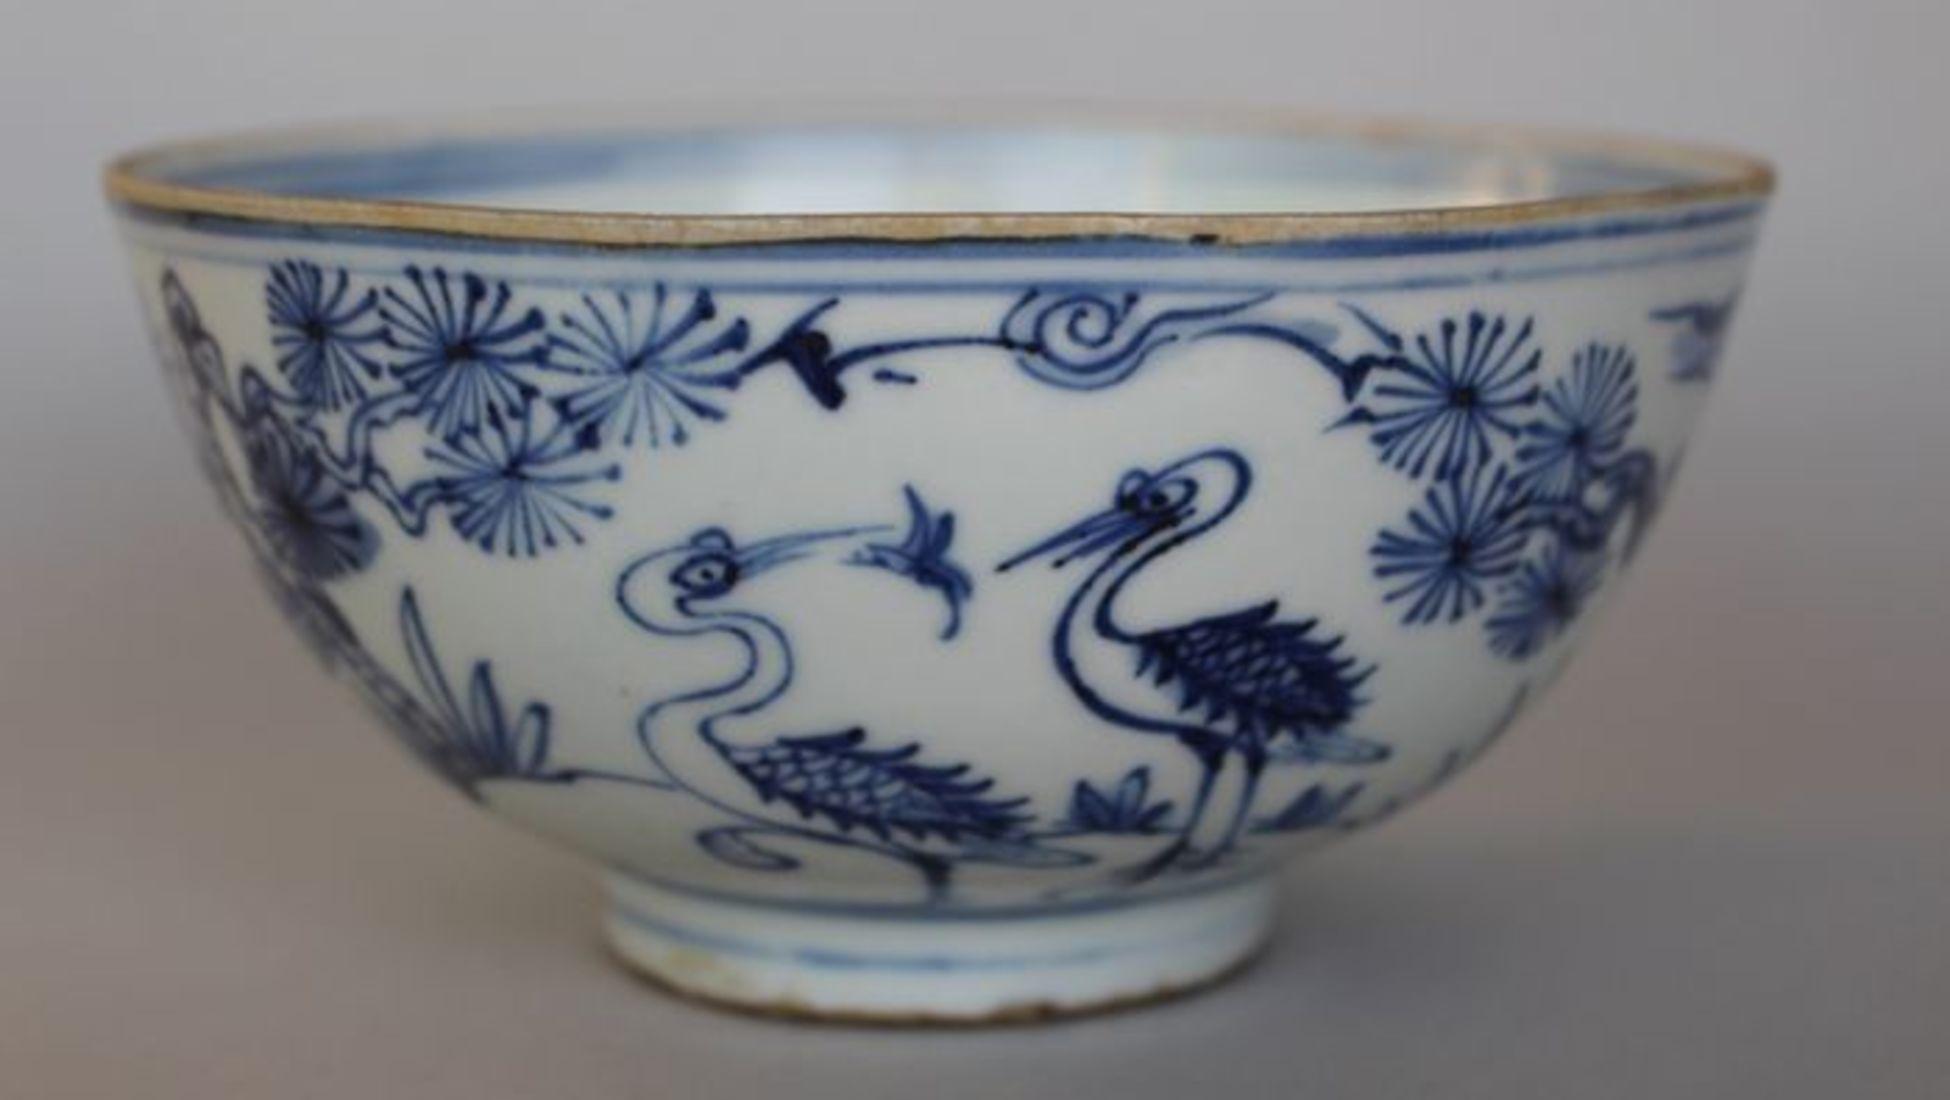 The secret of Chinese porcelain - Catawiki